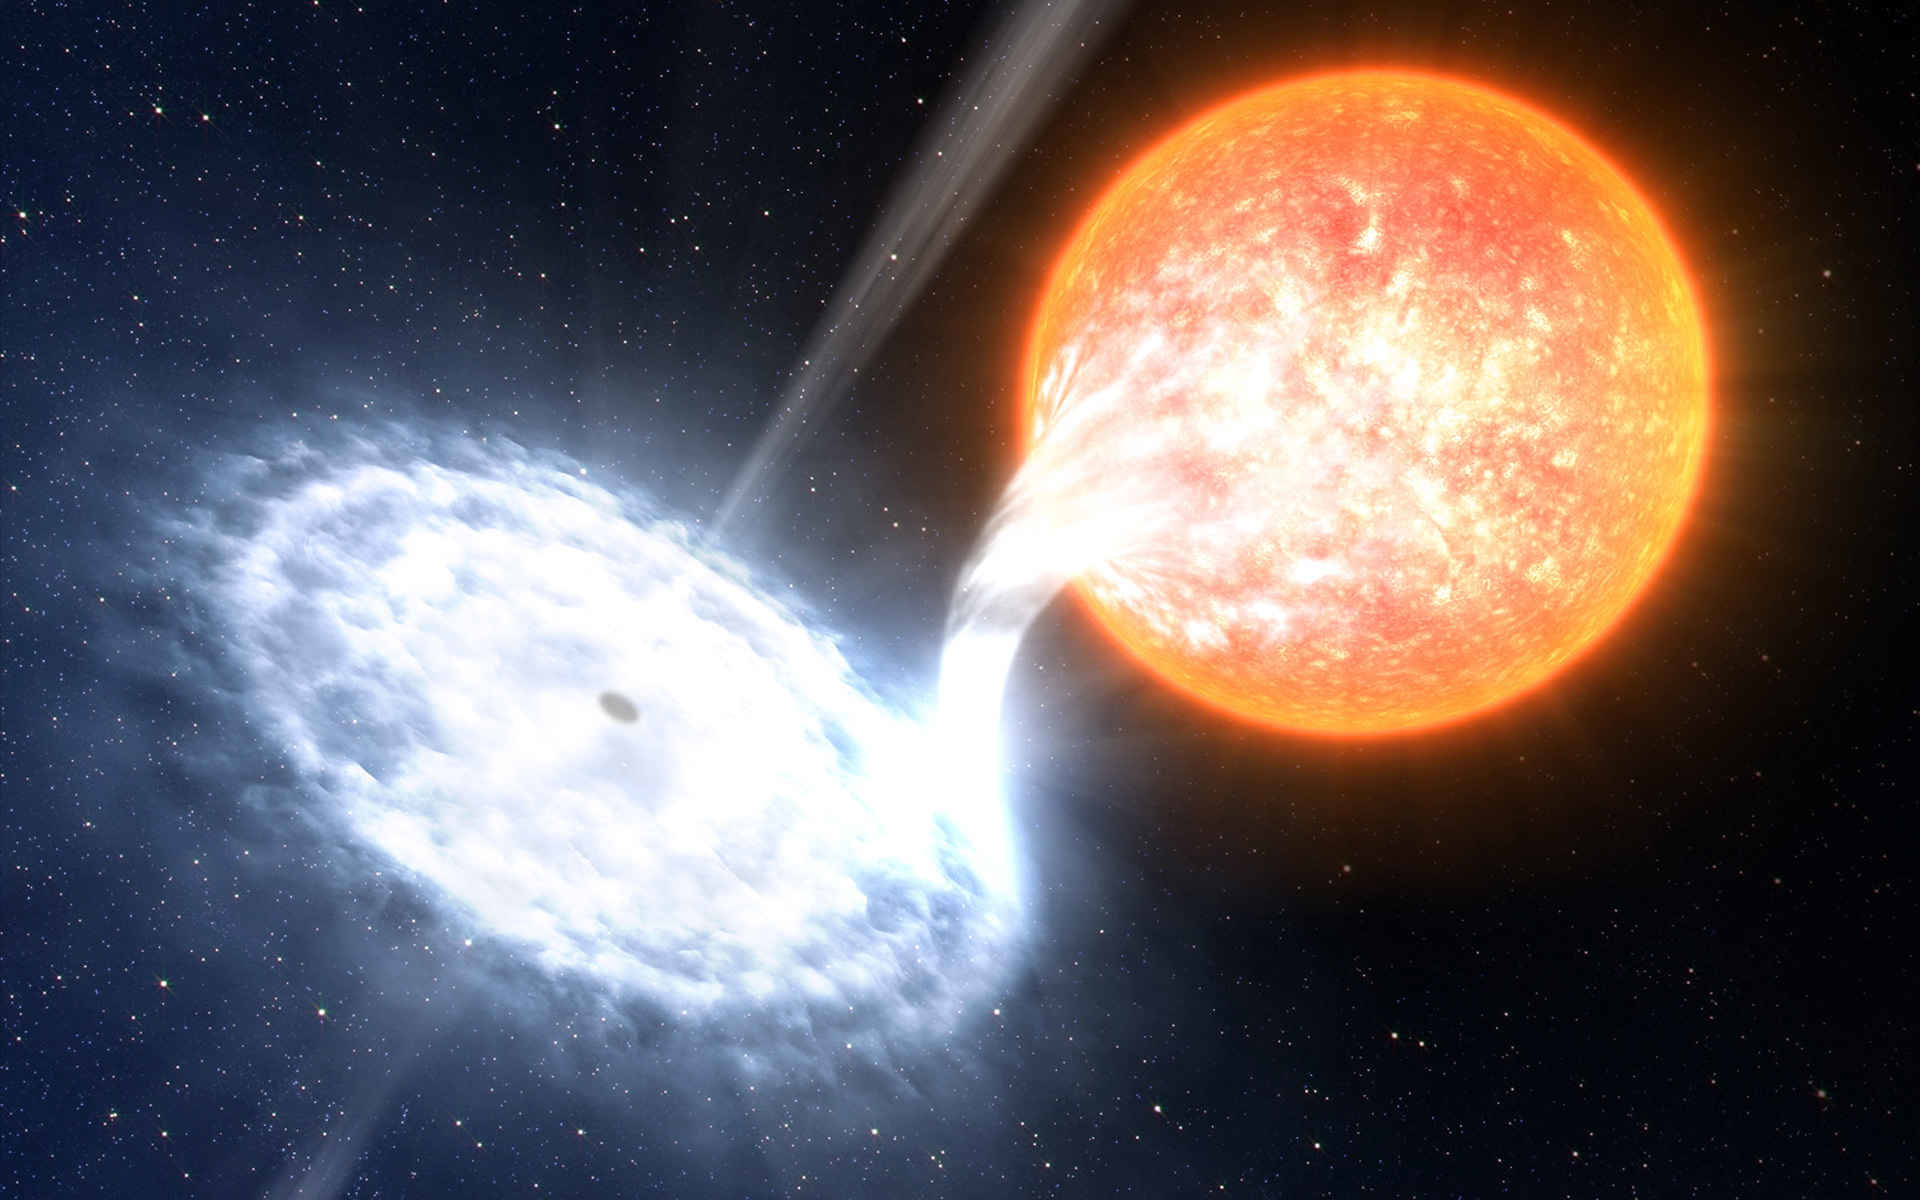 Interstellar Blackhole 2 Wallpaper (2560 x 1080) by ABAthedude .